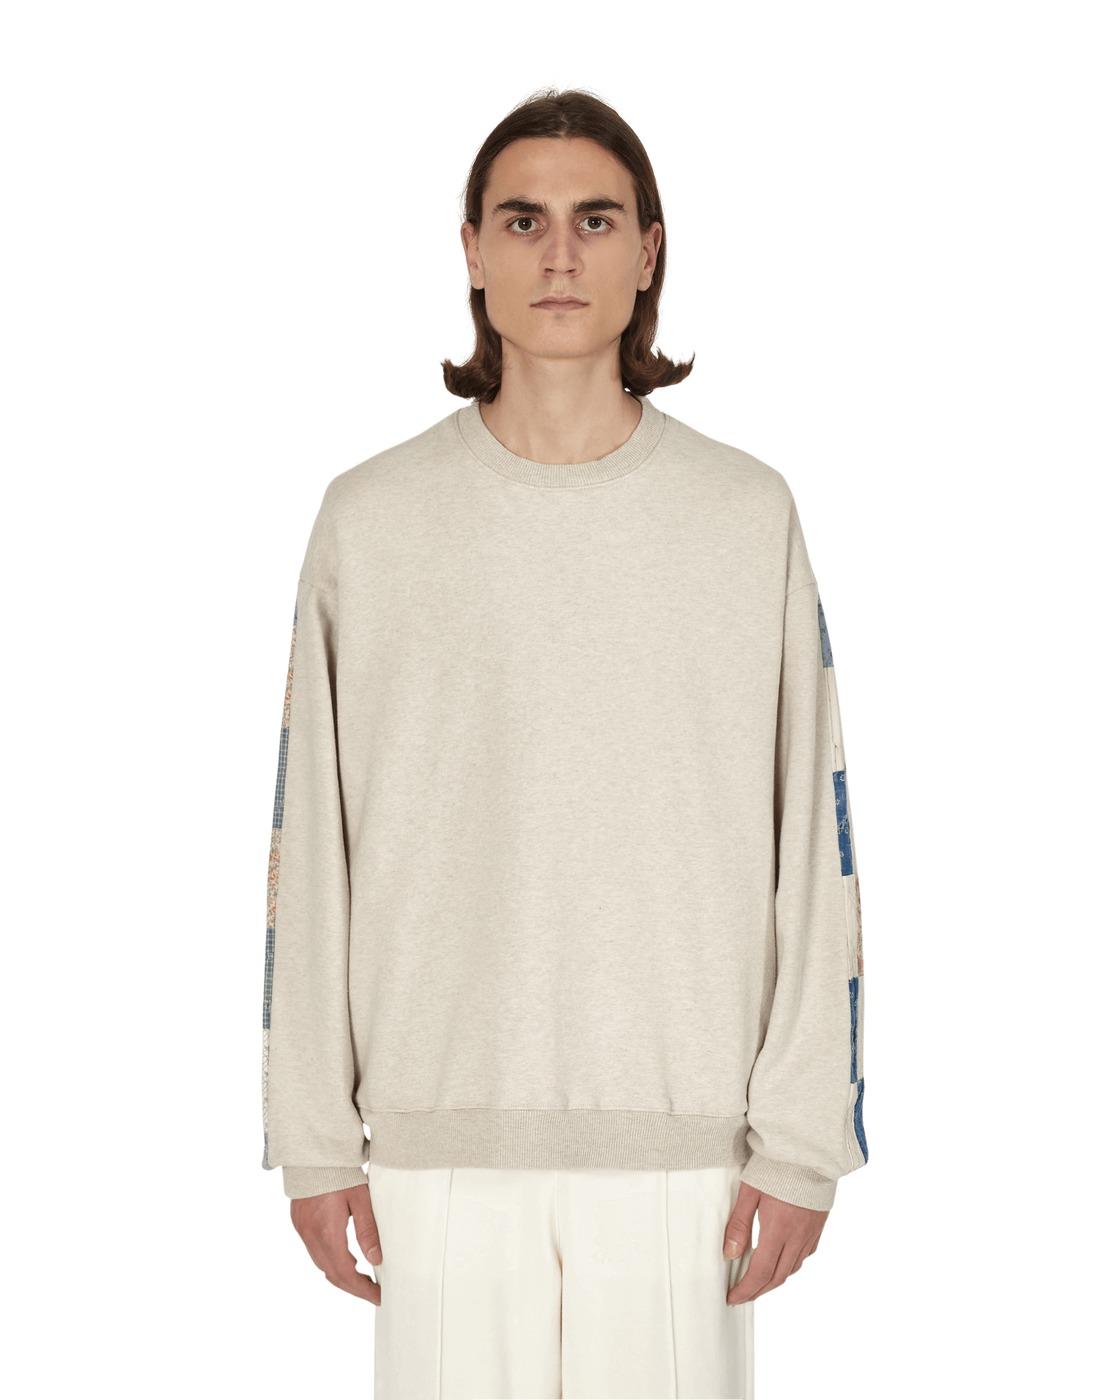 Photo: Kapital Fleecy Knit X American Quilt Country 2tones Big Sweatshirt Ecru